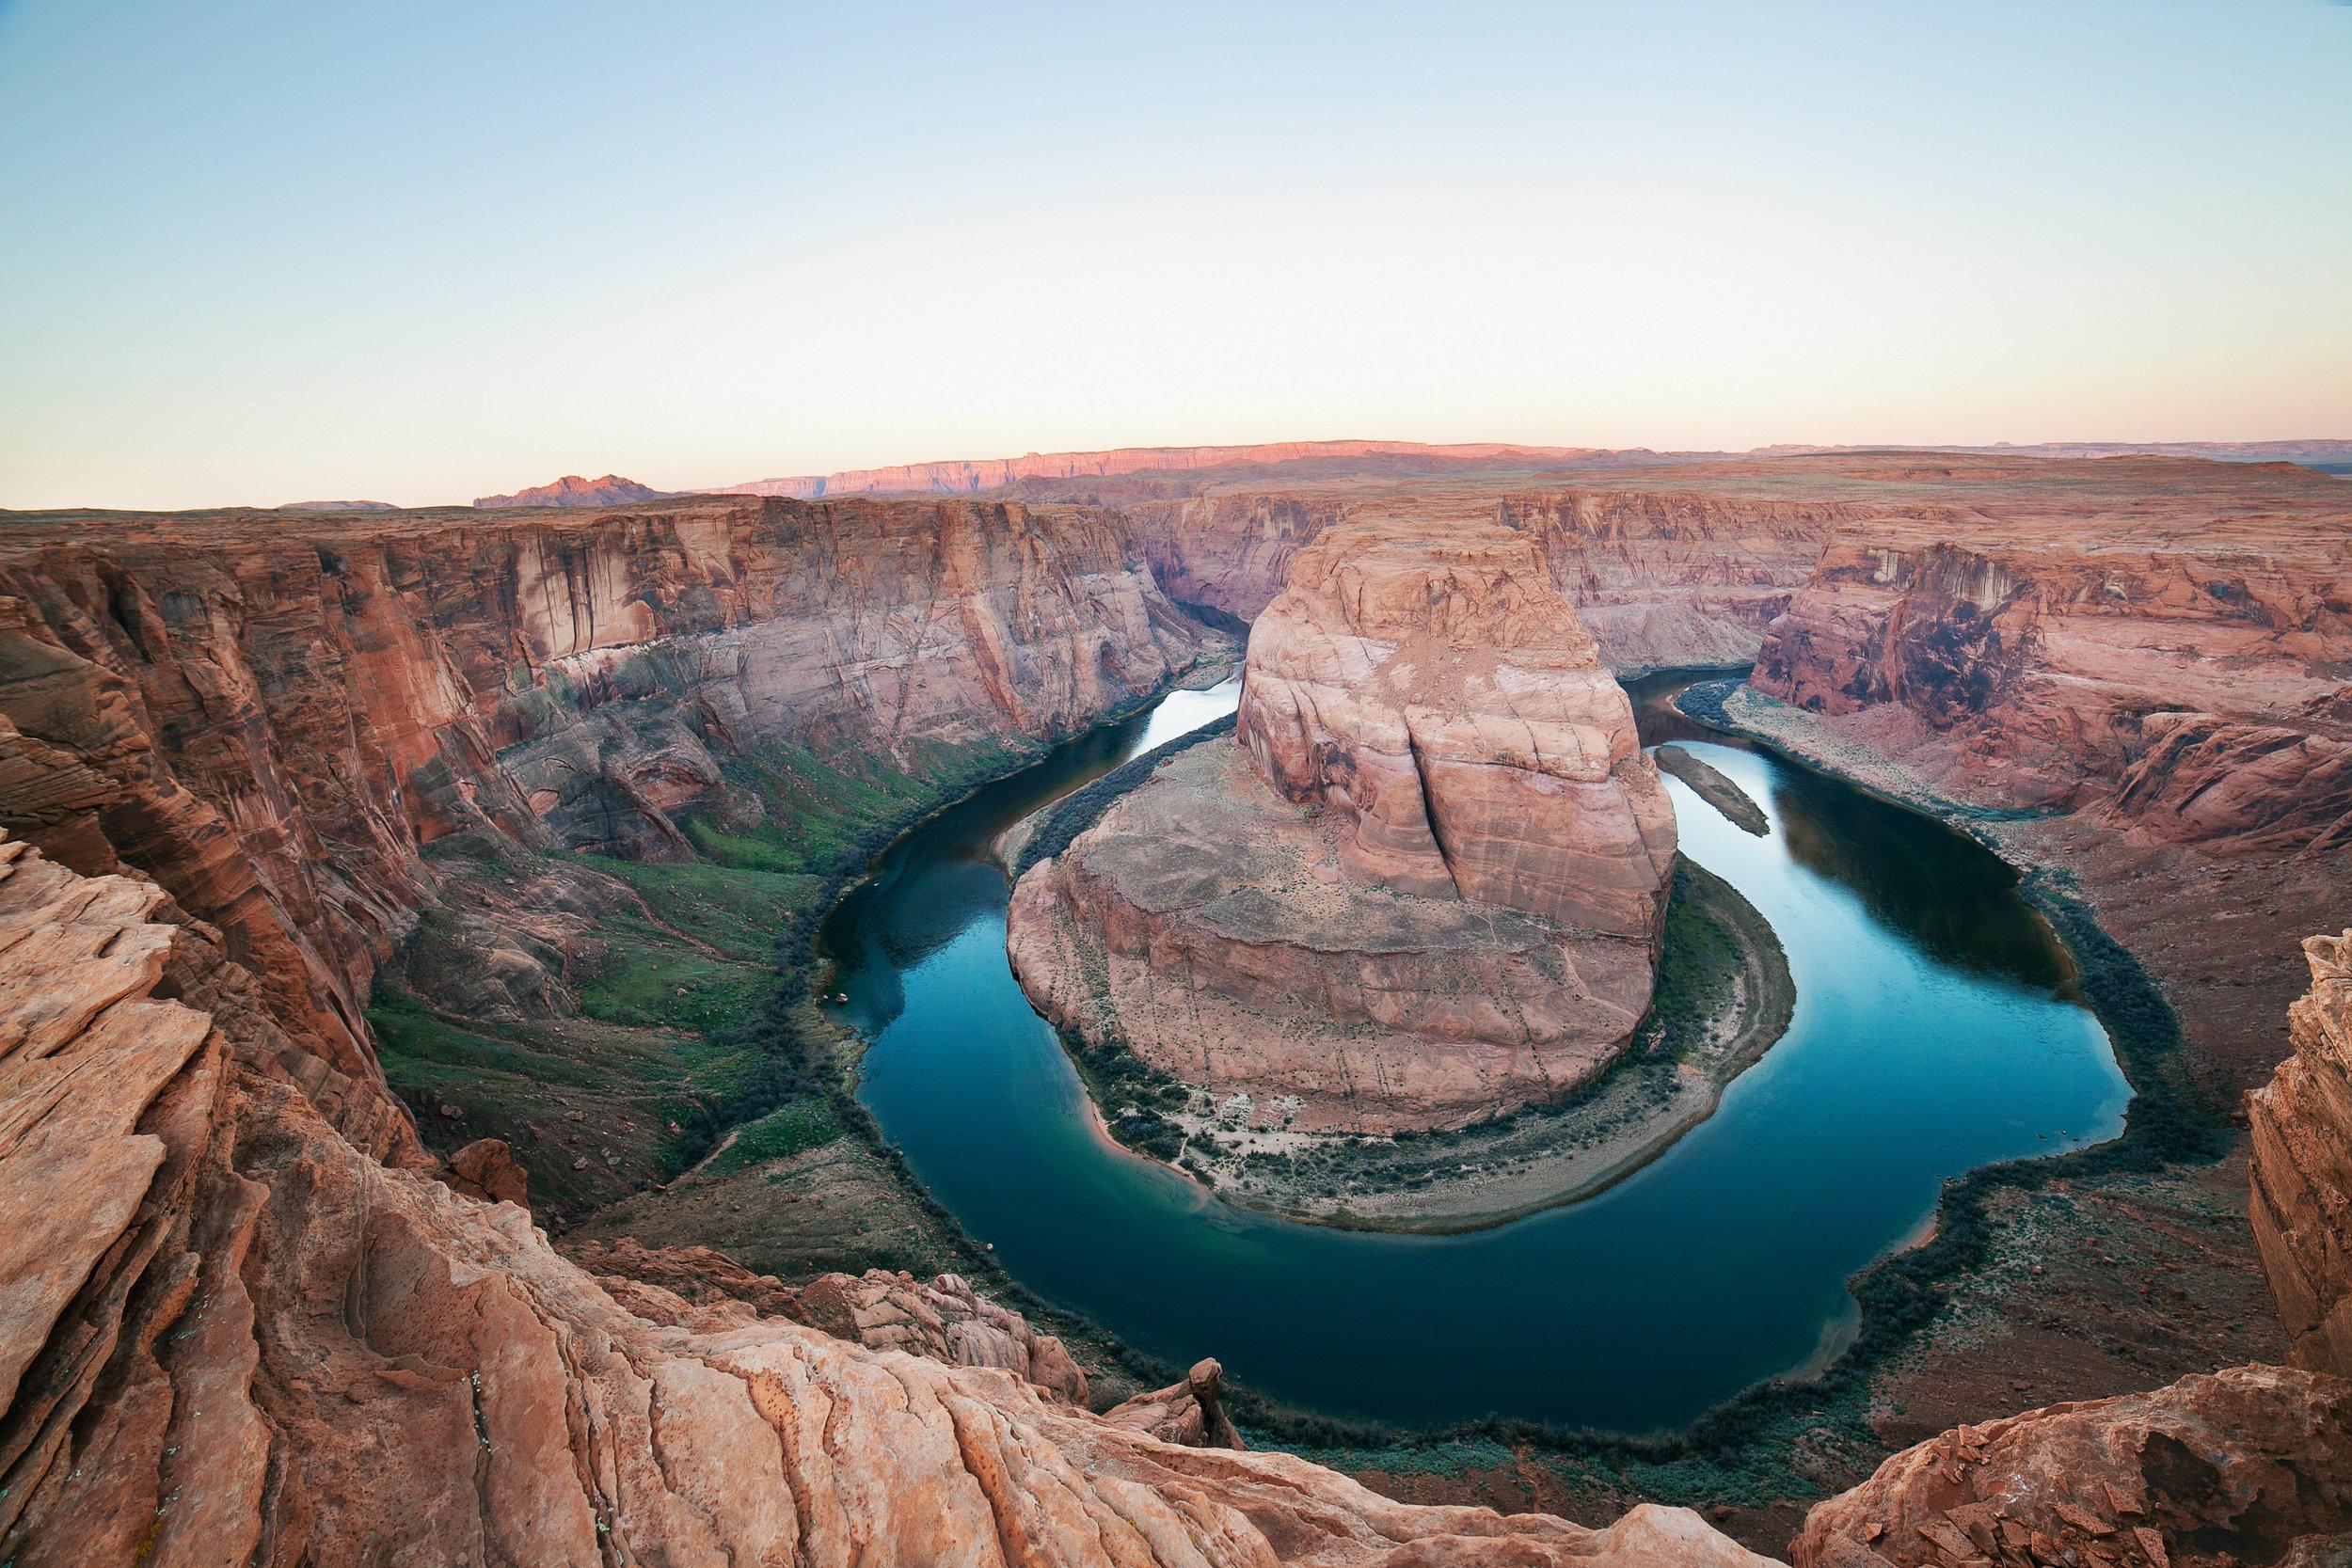 013Travel_Adventure_Photography_Outlive_Creative_Utah.jpg